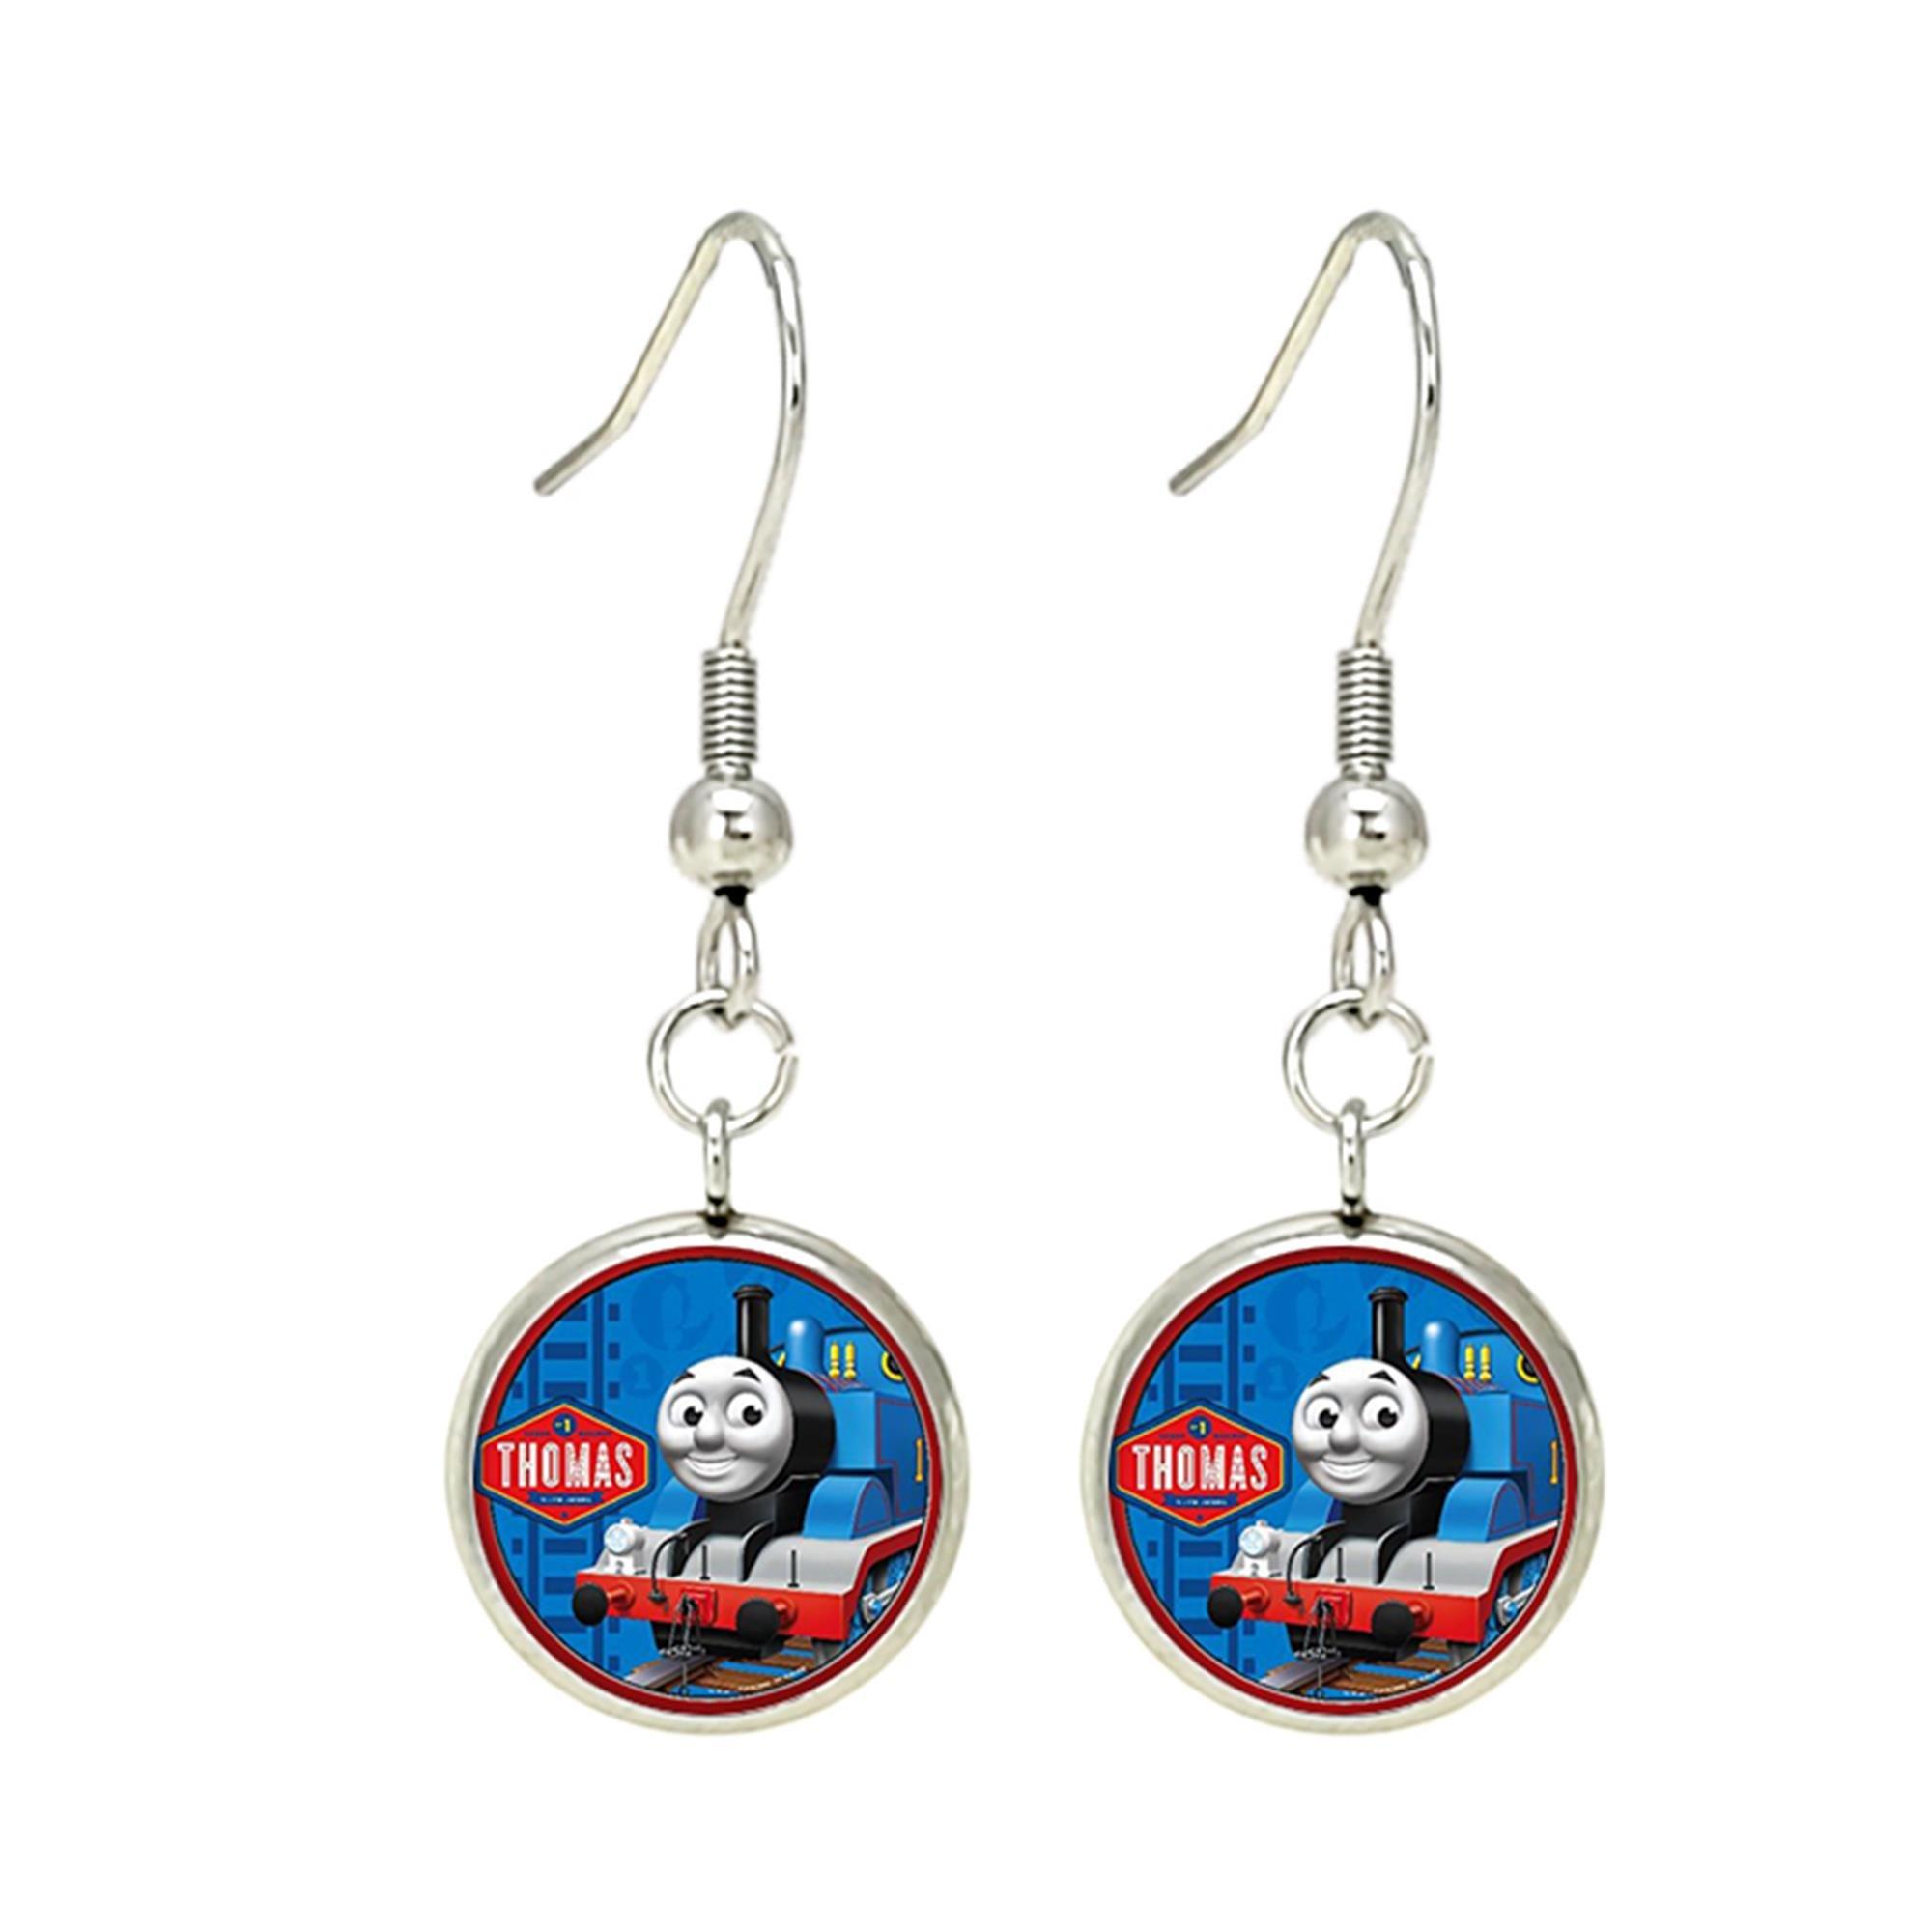 Thomas the Train Dangle Earrings TV Movies Classic Cartoons Superhero Logo Theme Premium Quality Detailed Cosplay Jewelry Gift Series